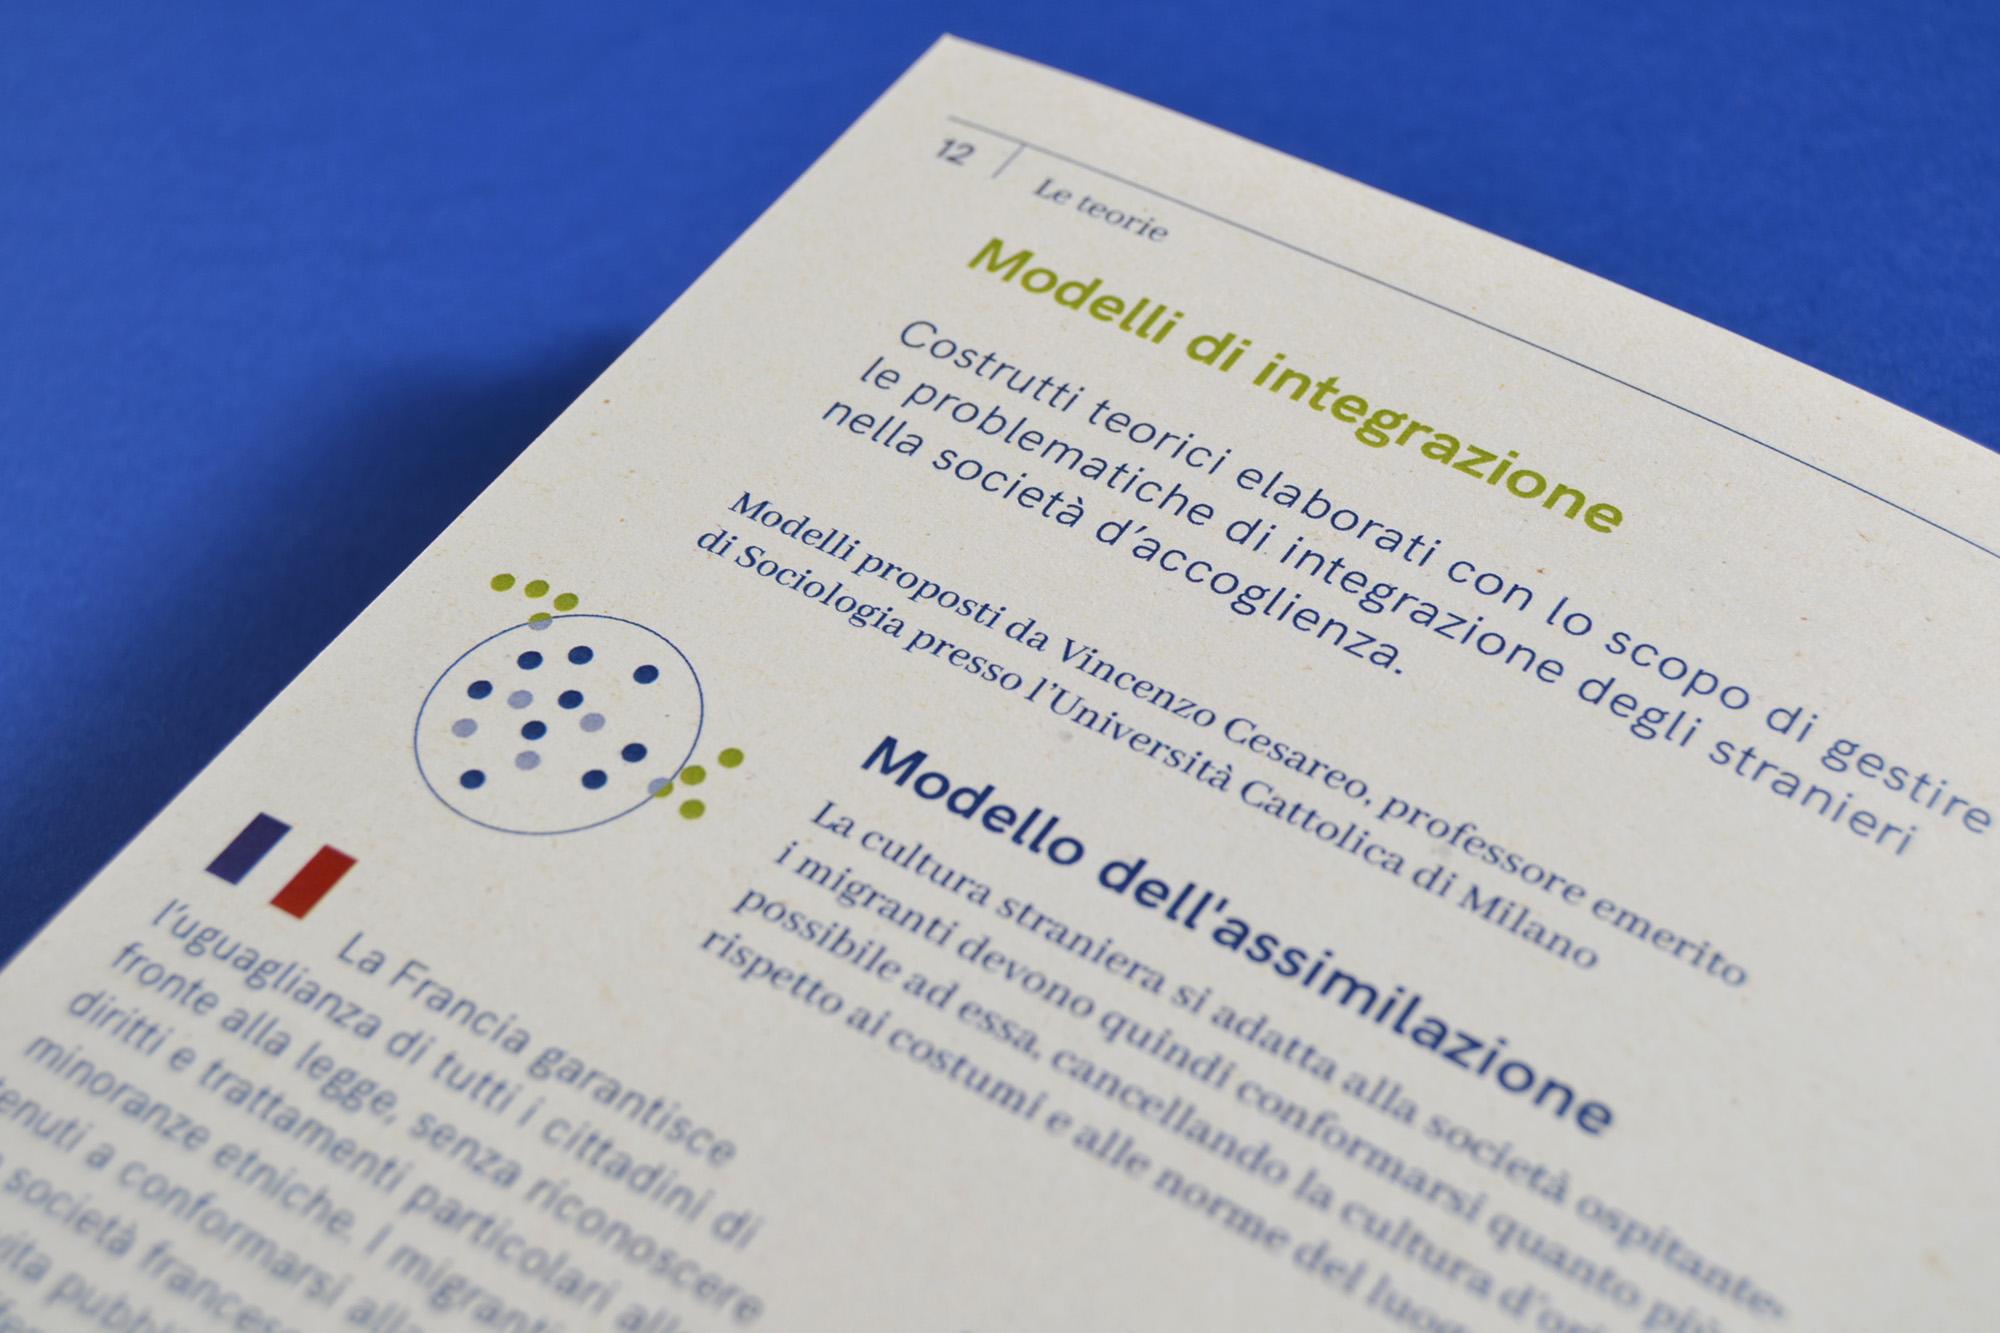 Vademecu Cinzia Bongin migrant refugees design for migration